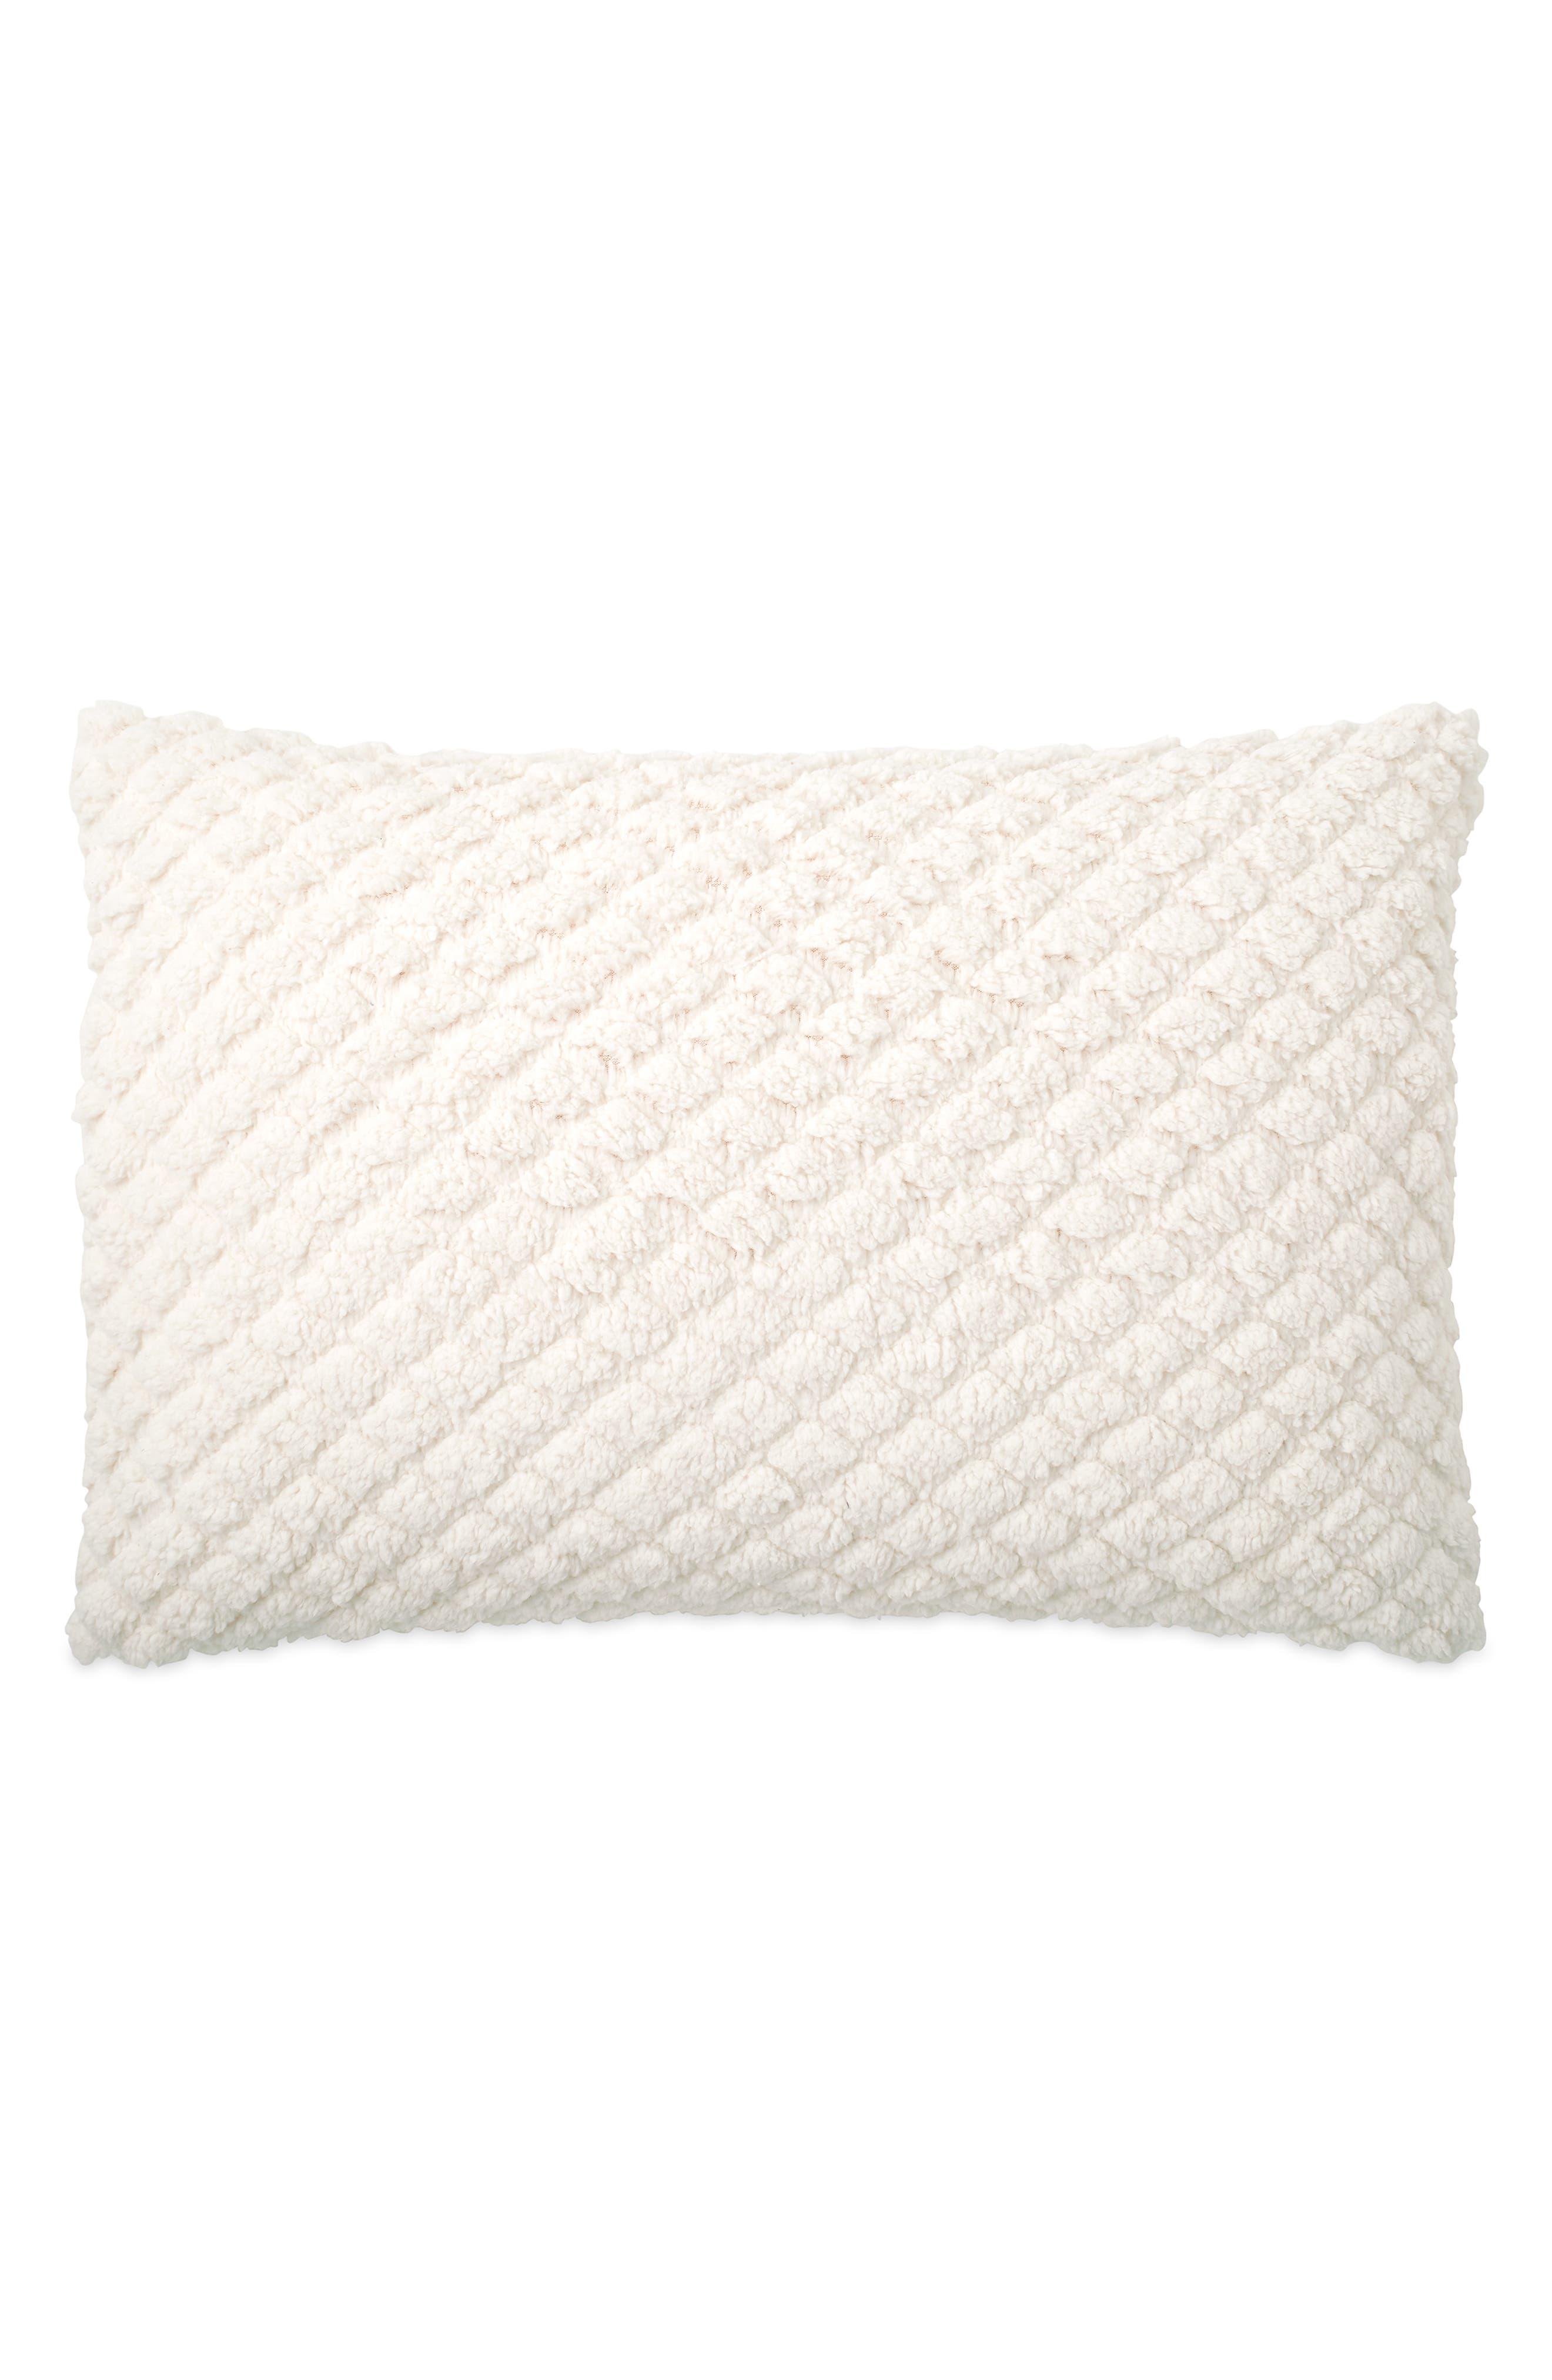 Diamond High Pile Fleece Comforter & Sham Set,                             Alternate thumbnail 6, color,                             902